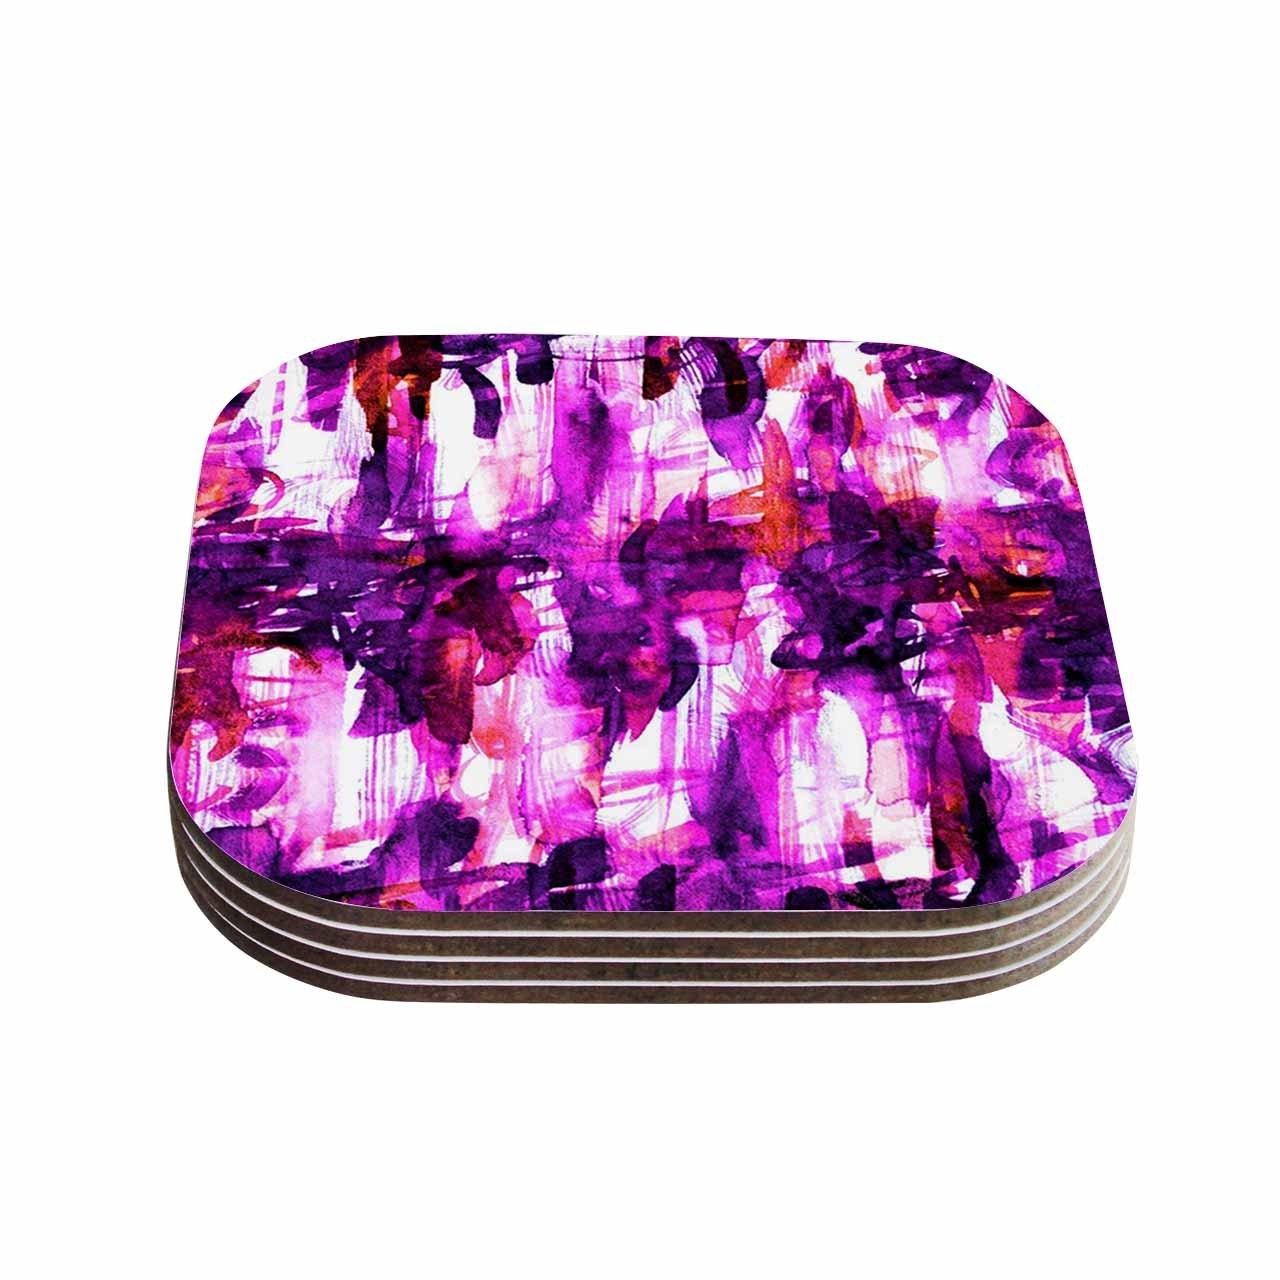 Set of 4 Multicolor KESS InHouse Ebi EmporiumWhite Noise 3 Purple Magenta Coasters 4 x 4